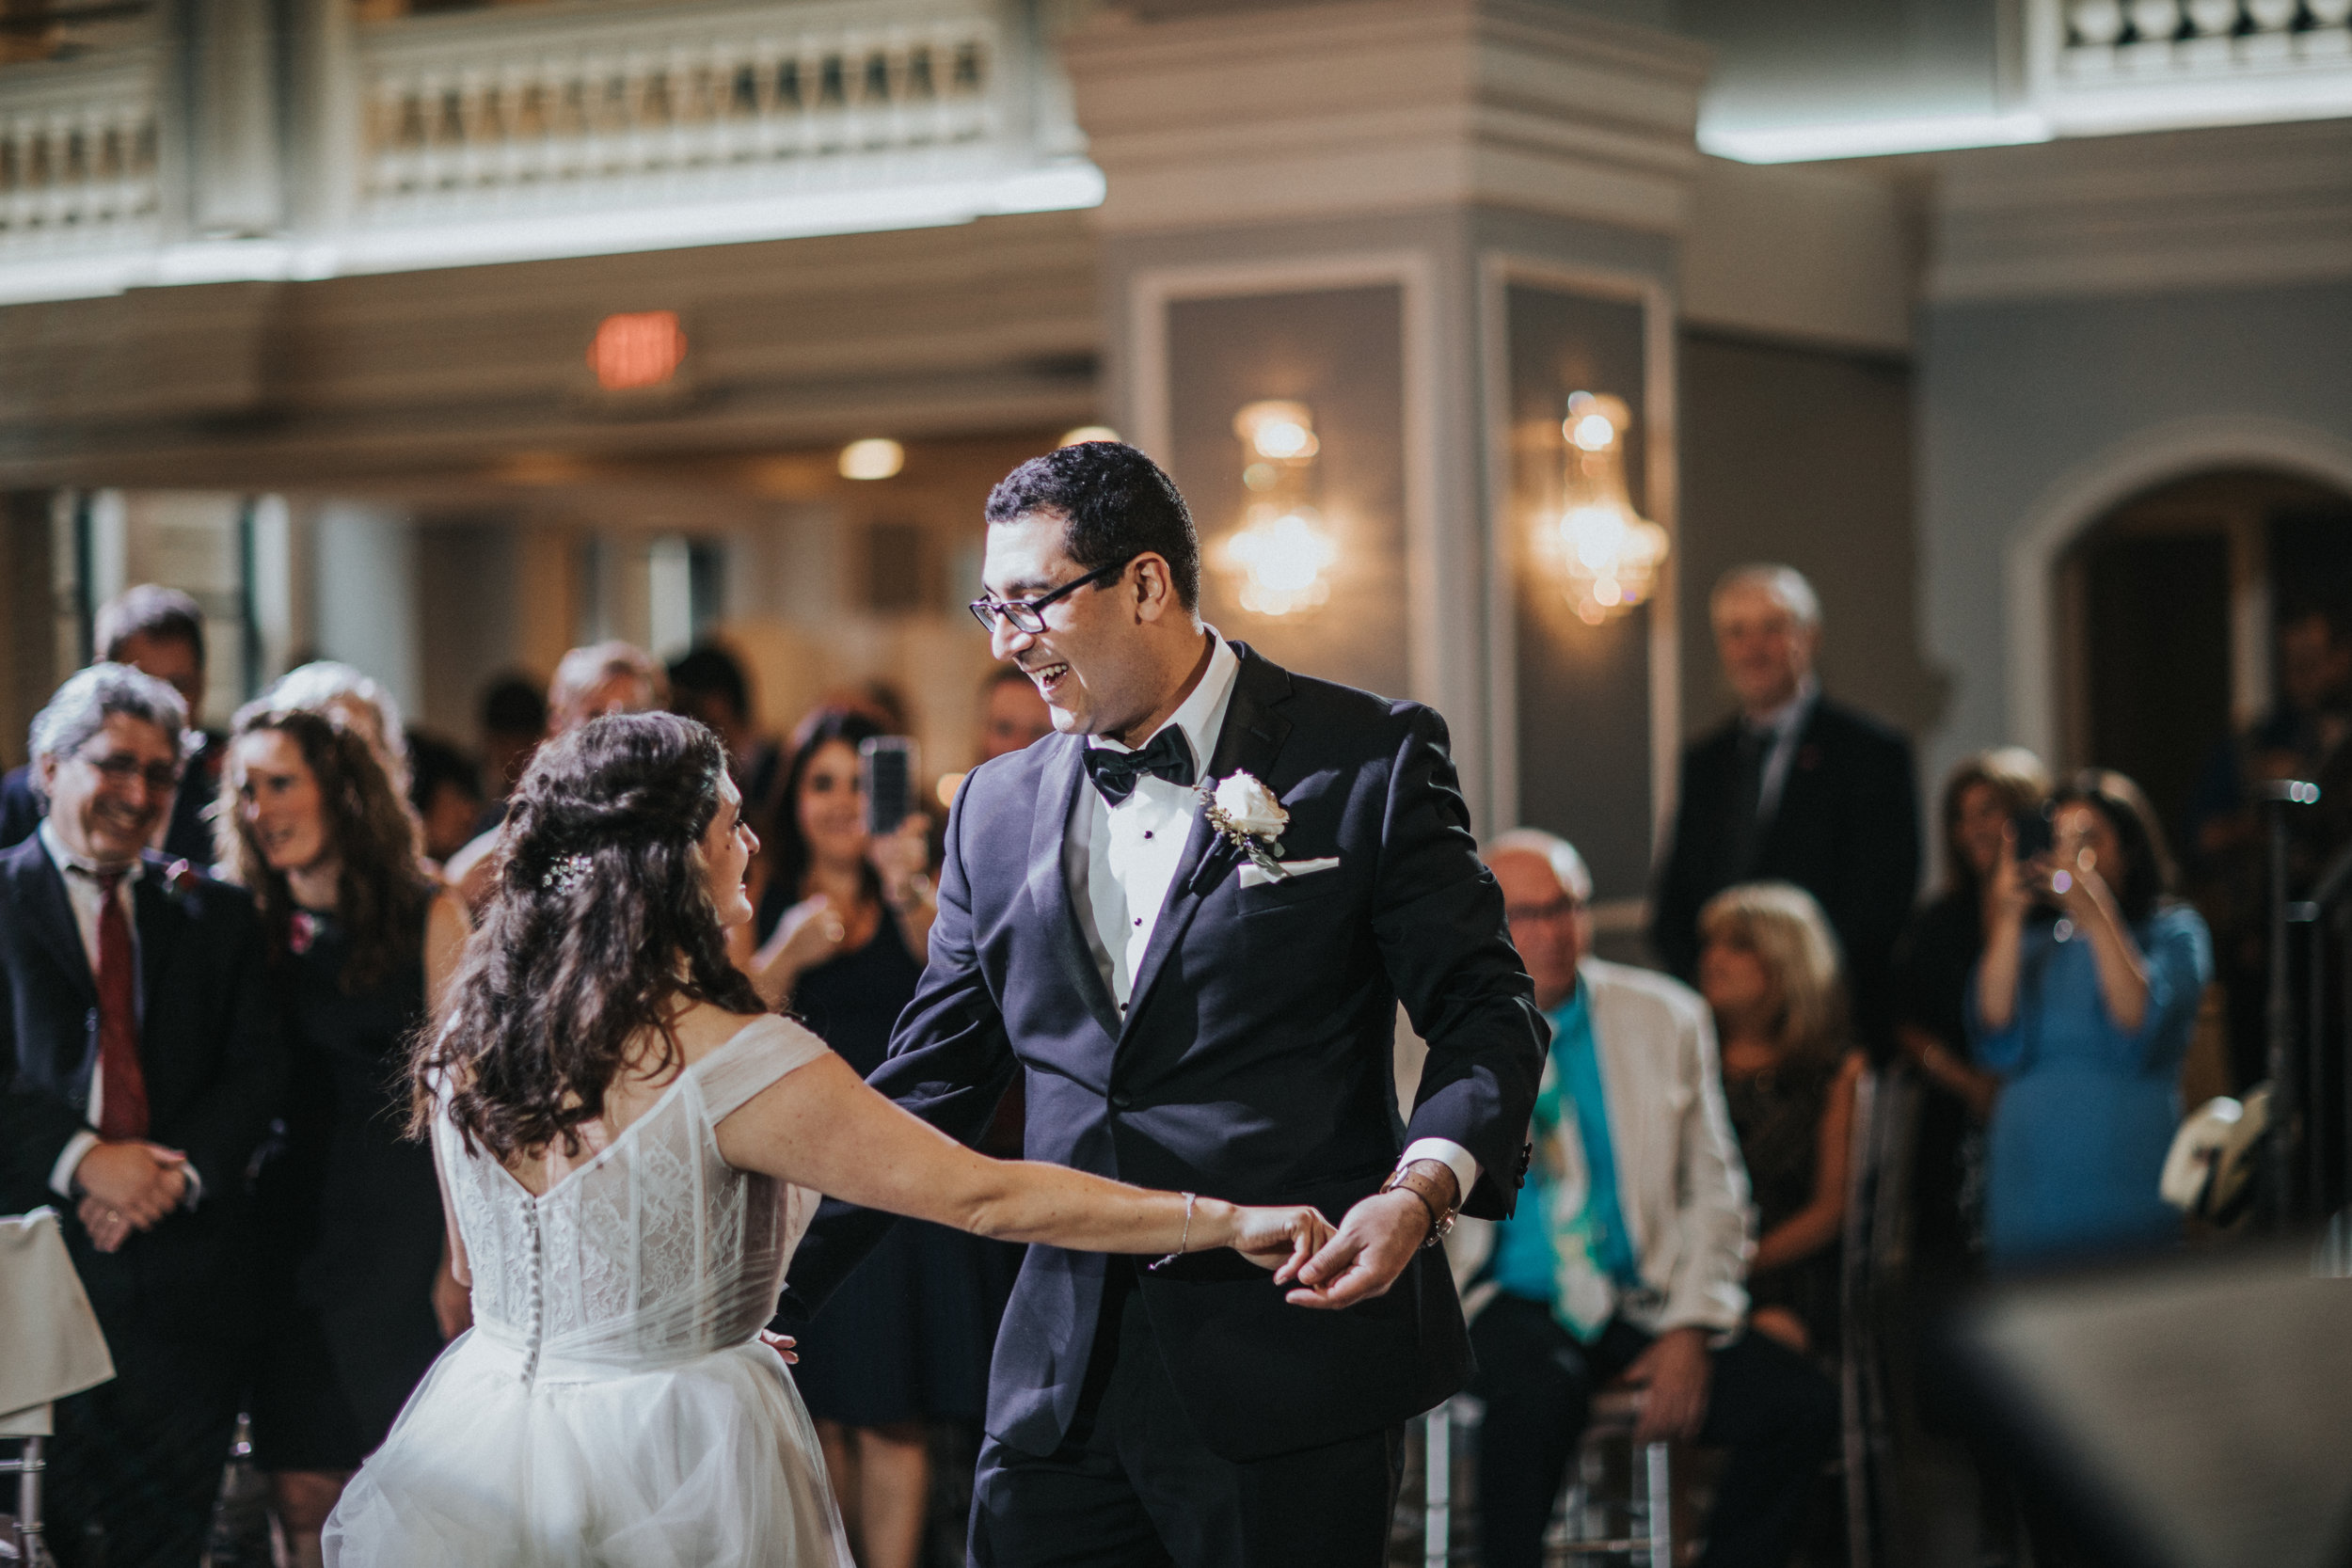 JennaLynnPhotography-NJWeddingPhotographer-Philadelphia-Wedding-ArtsBallroom-Reception-69.jpg